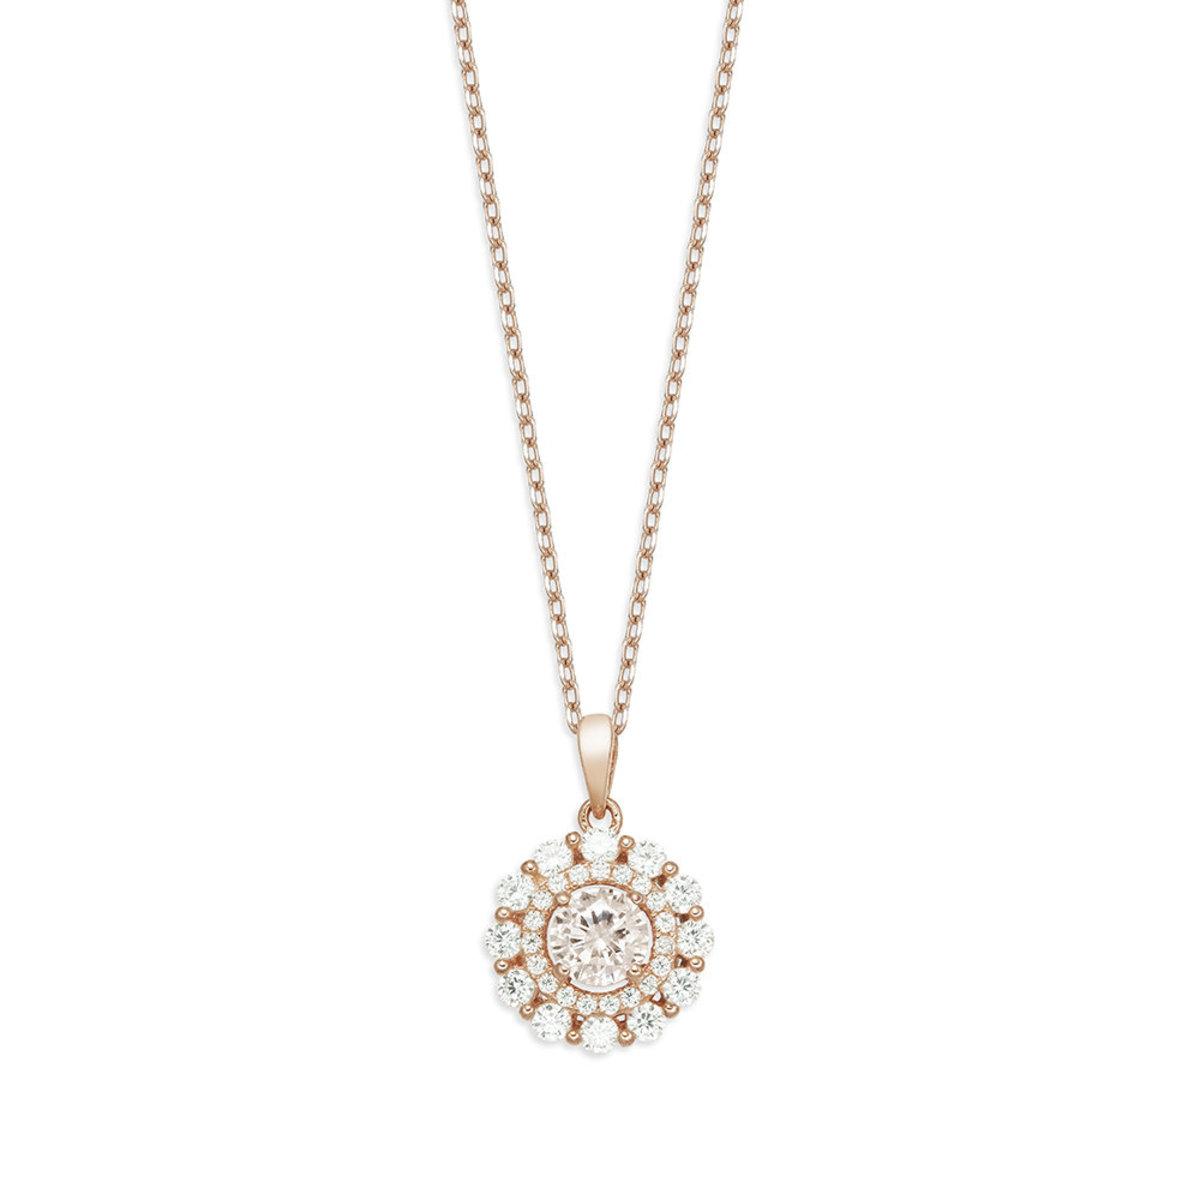 La Belle: 925 silver, rose gold plating, CZ stone necklace